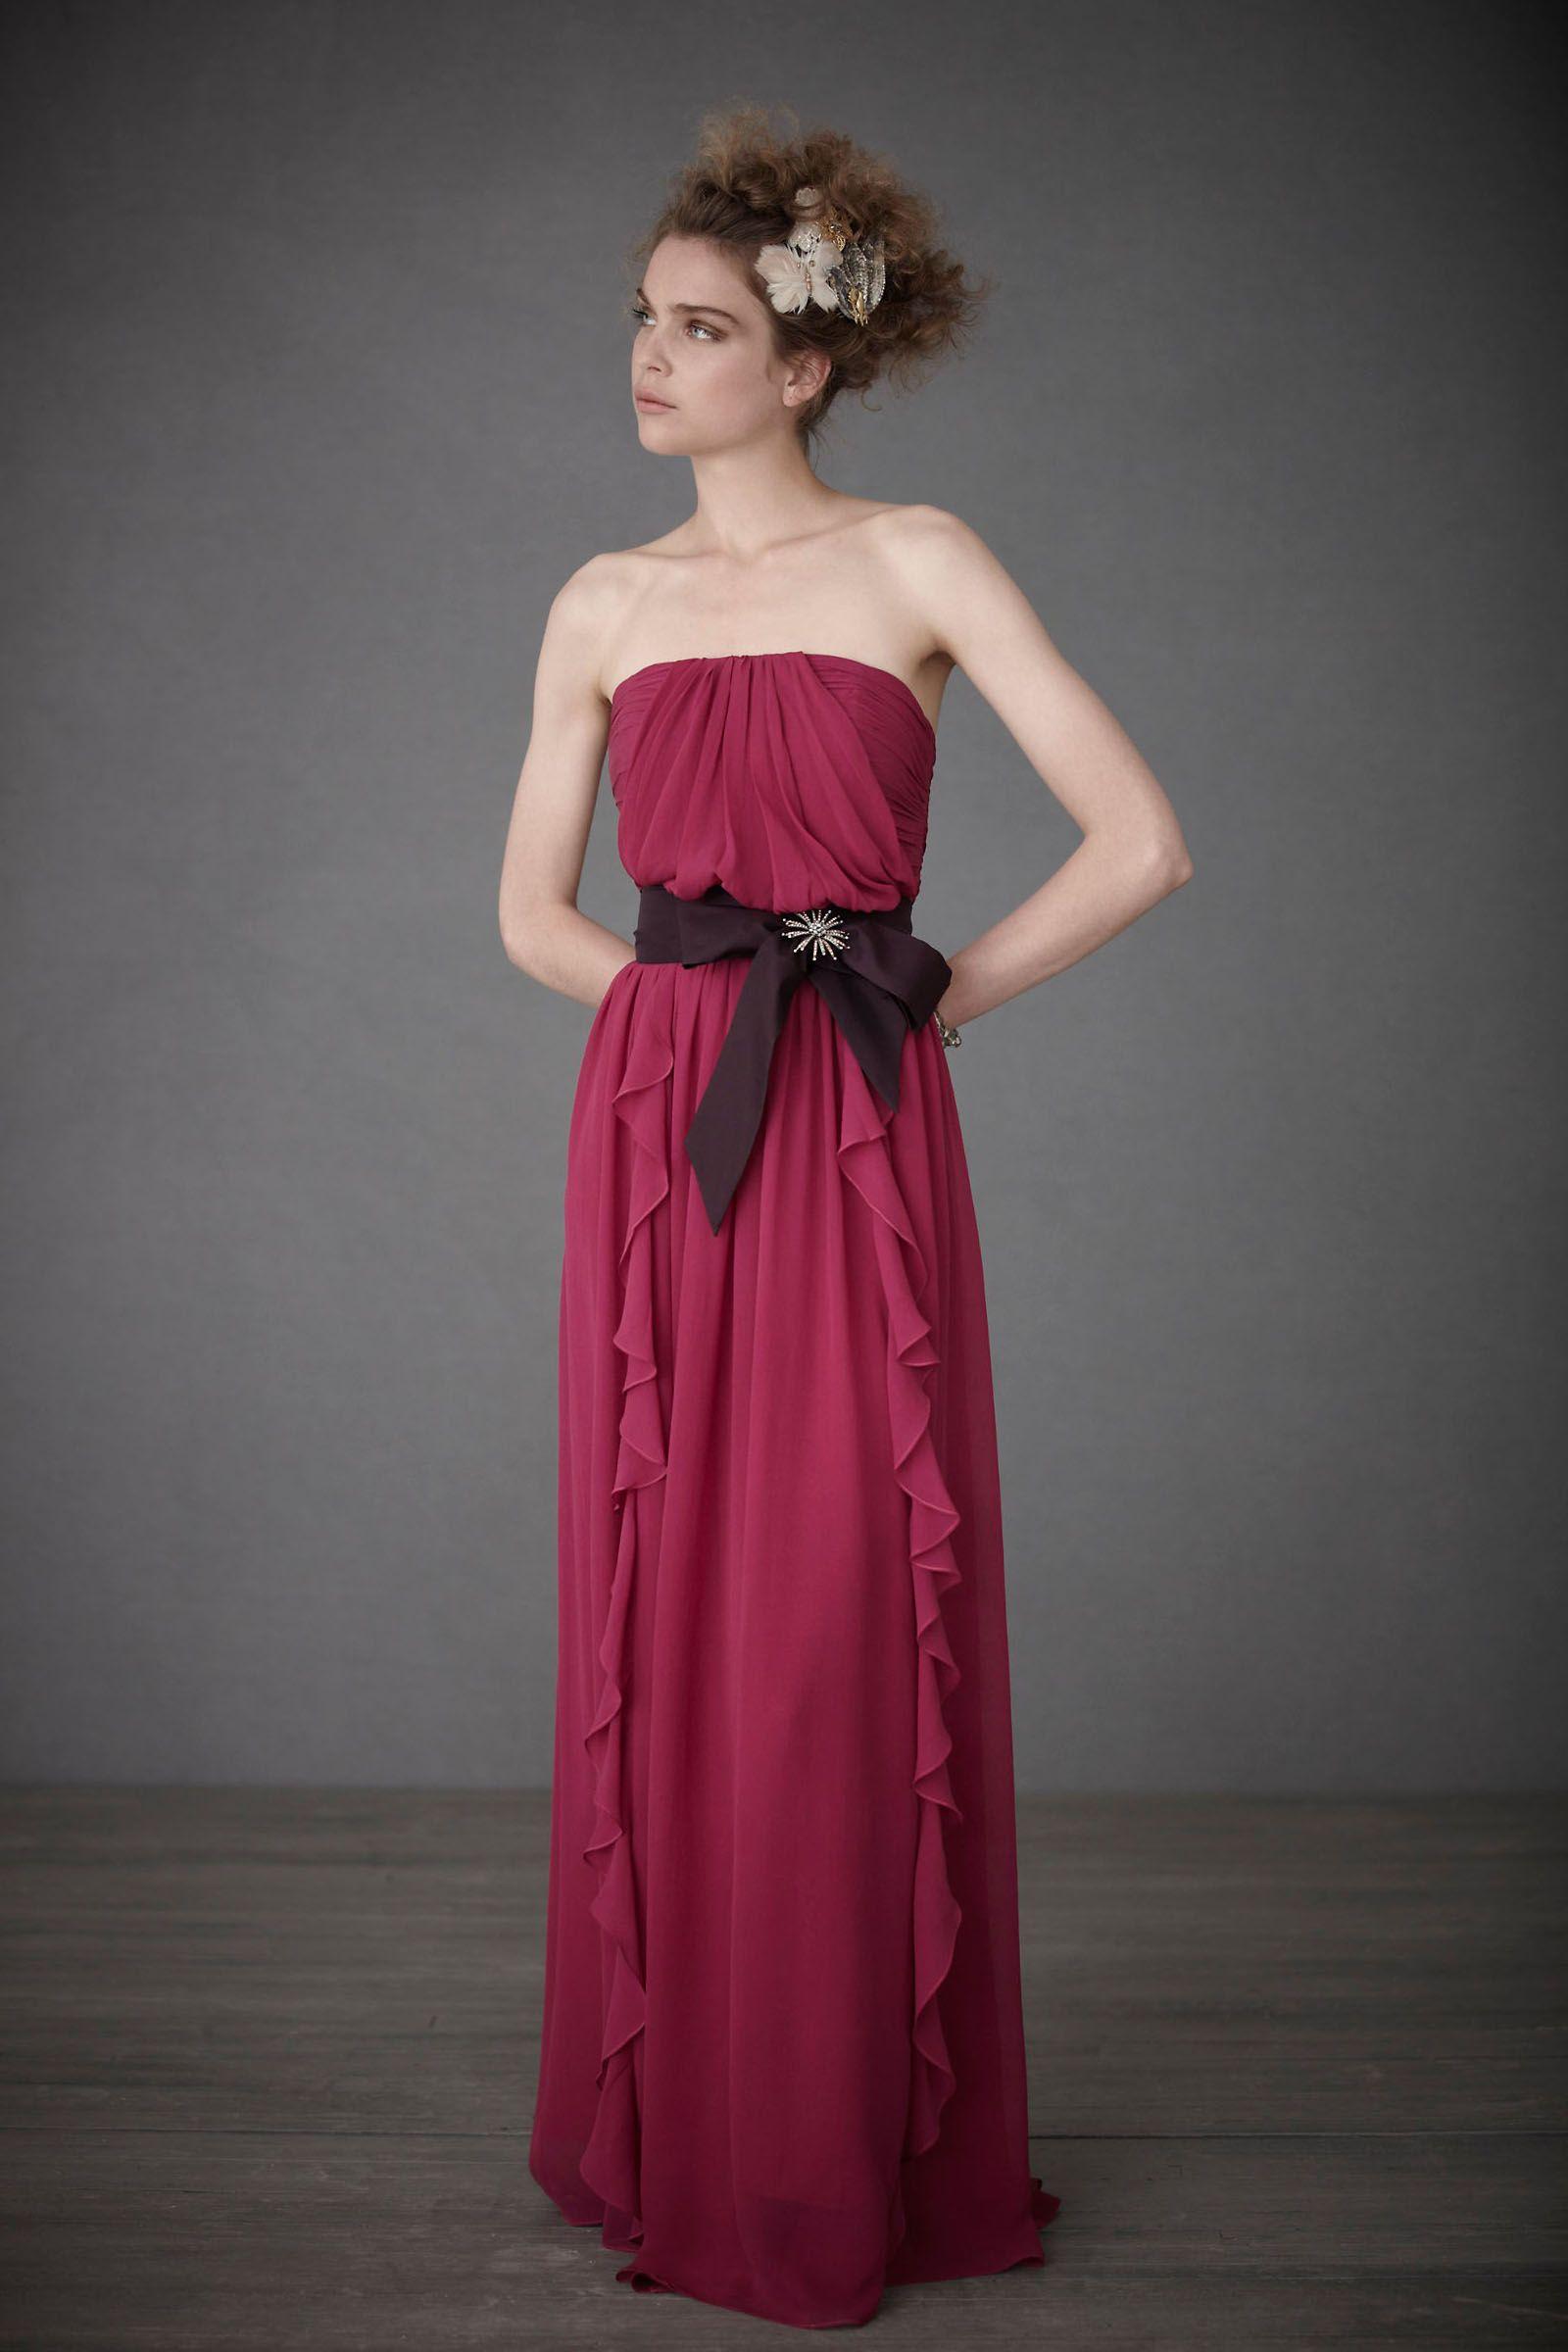 Watermelon Chiffon Floor-Length A-Line Prom Dress